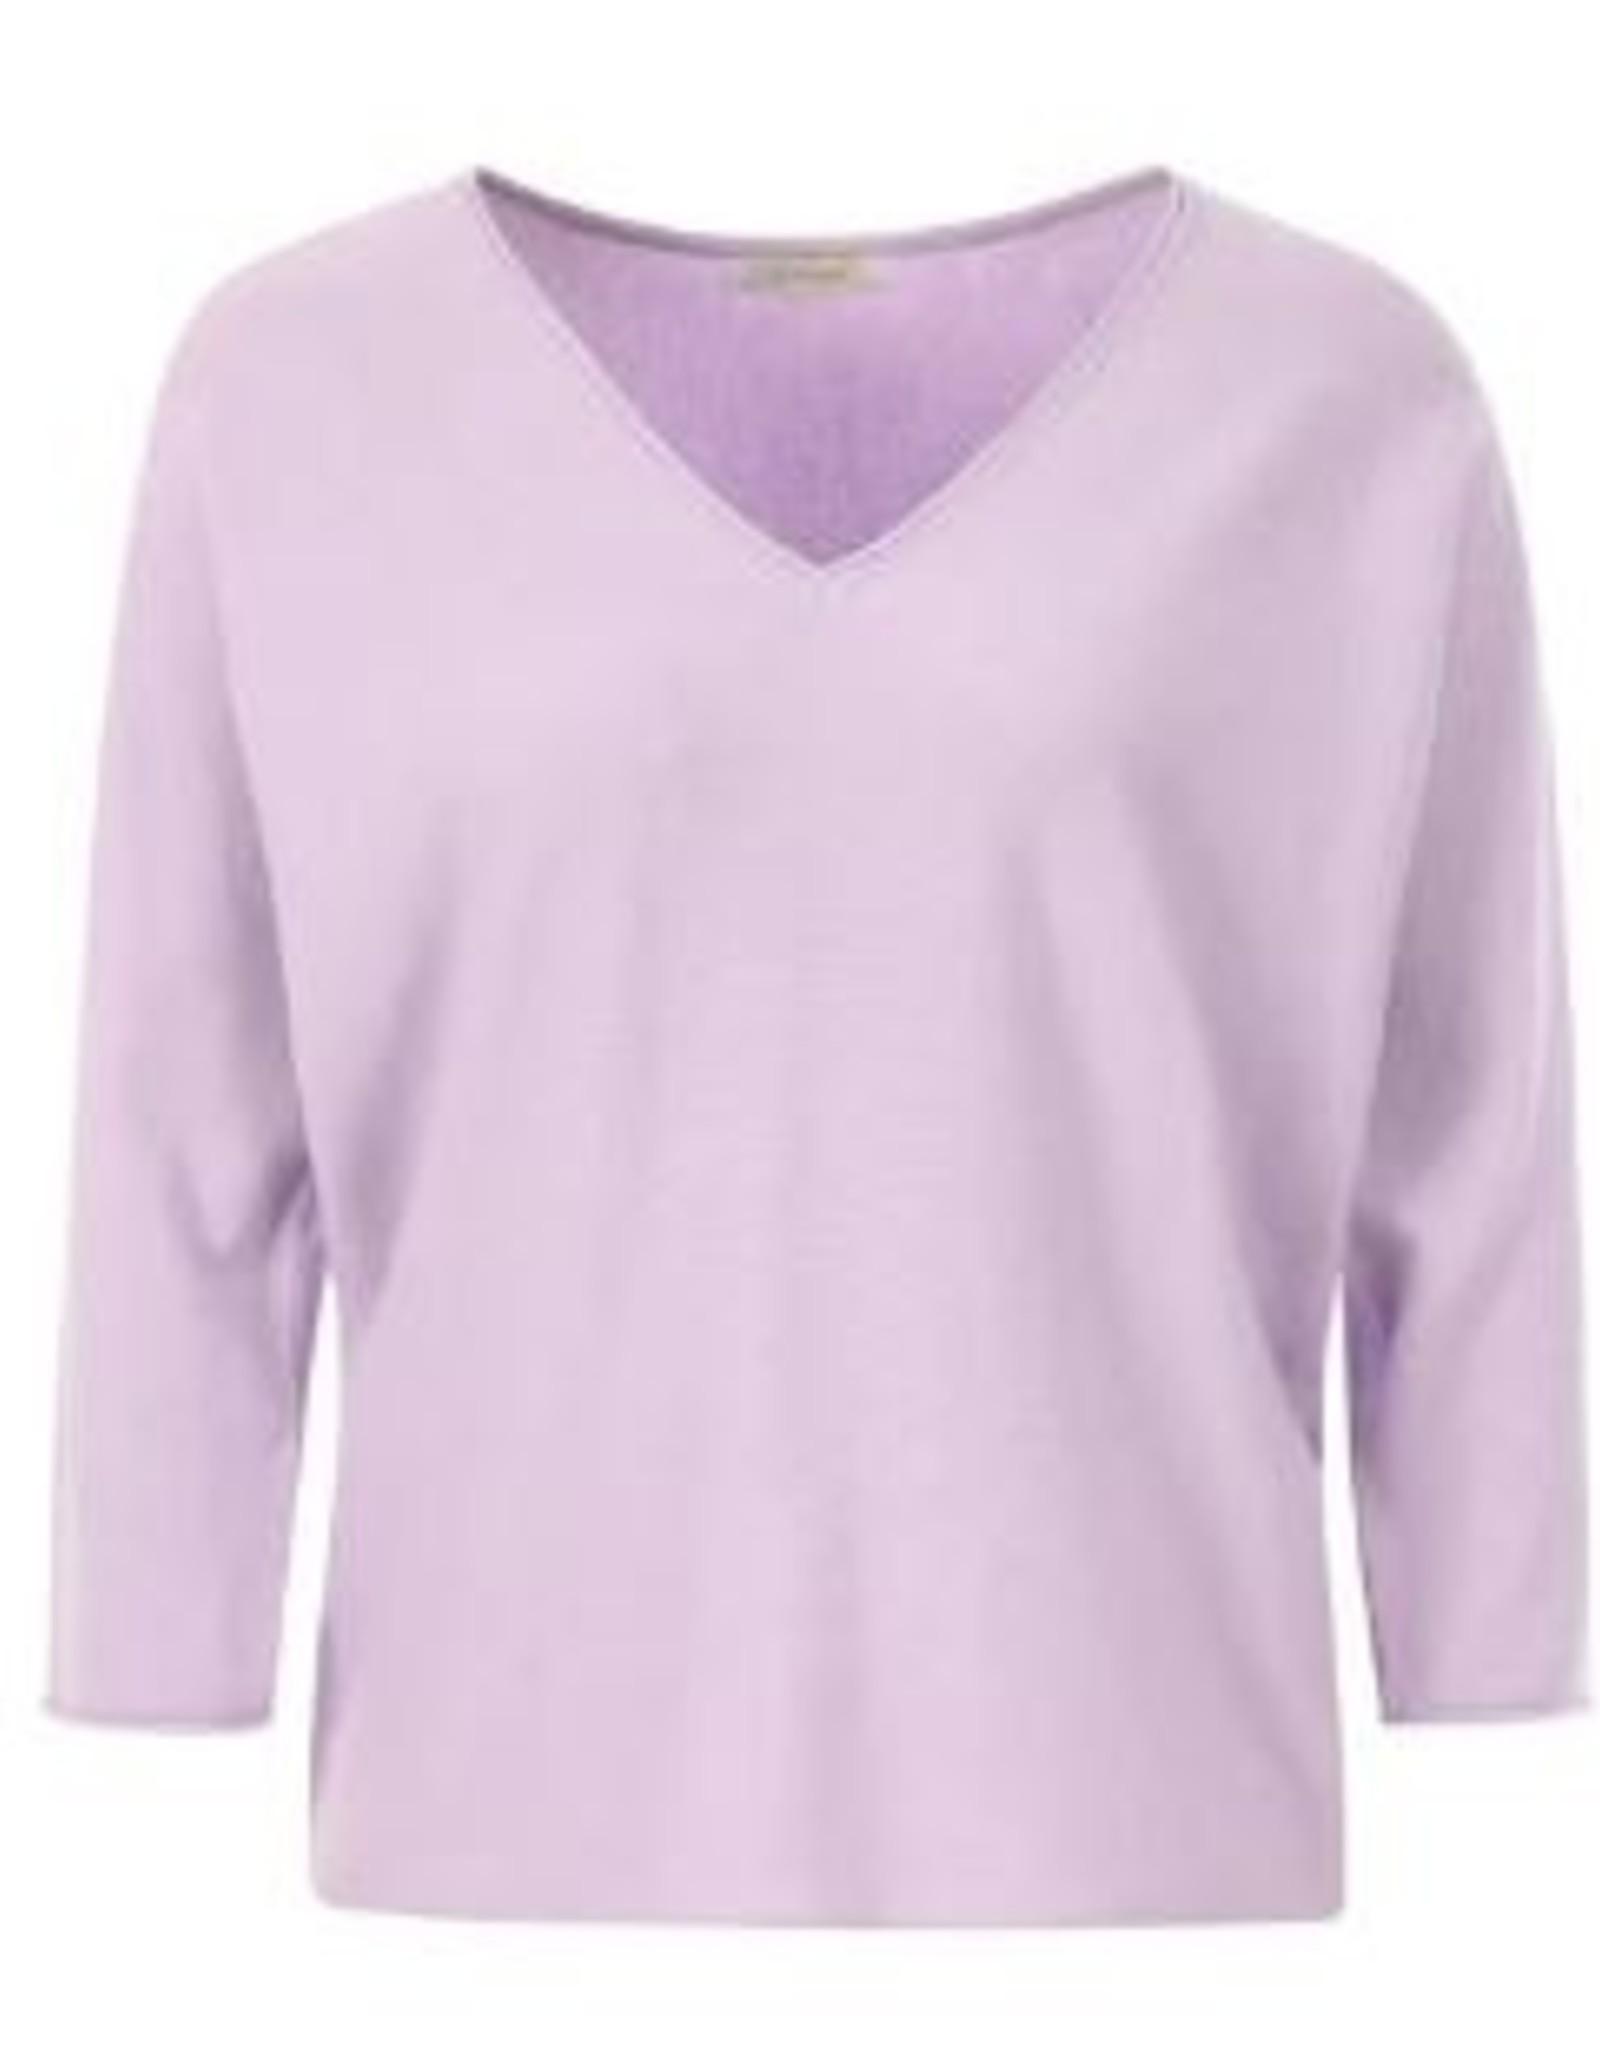 JcSophie Pullover Hortence Lavendel